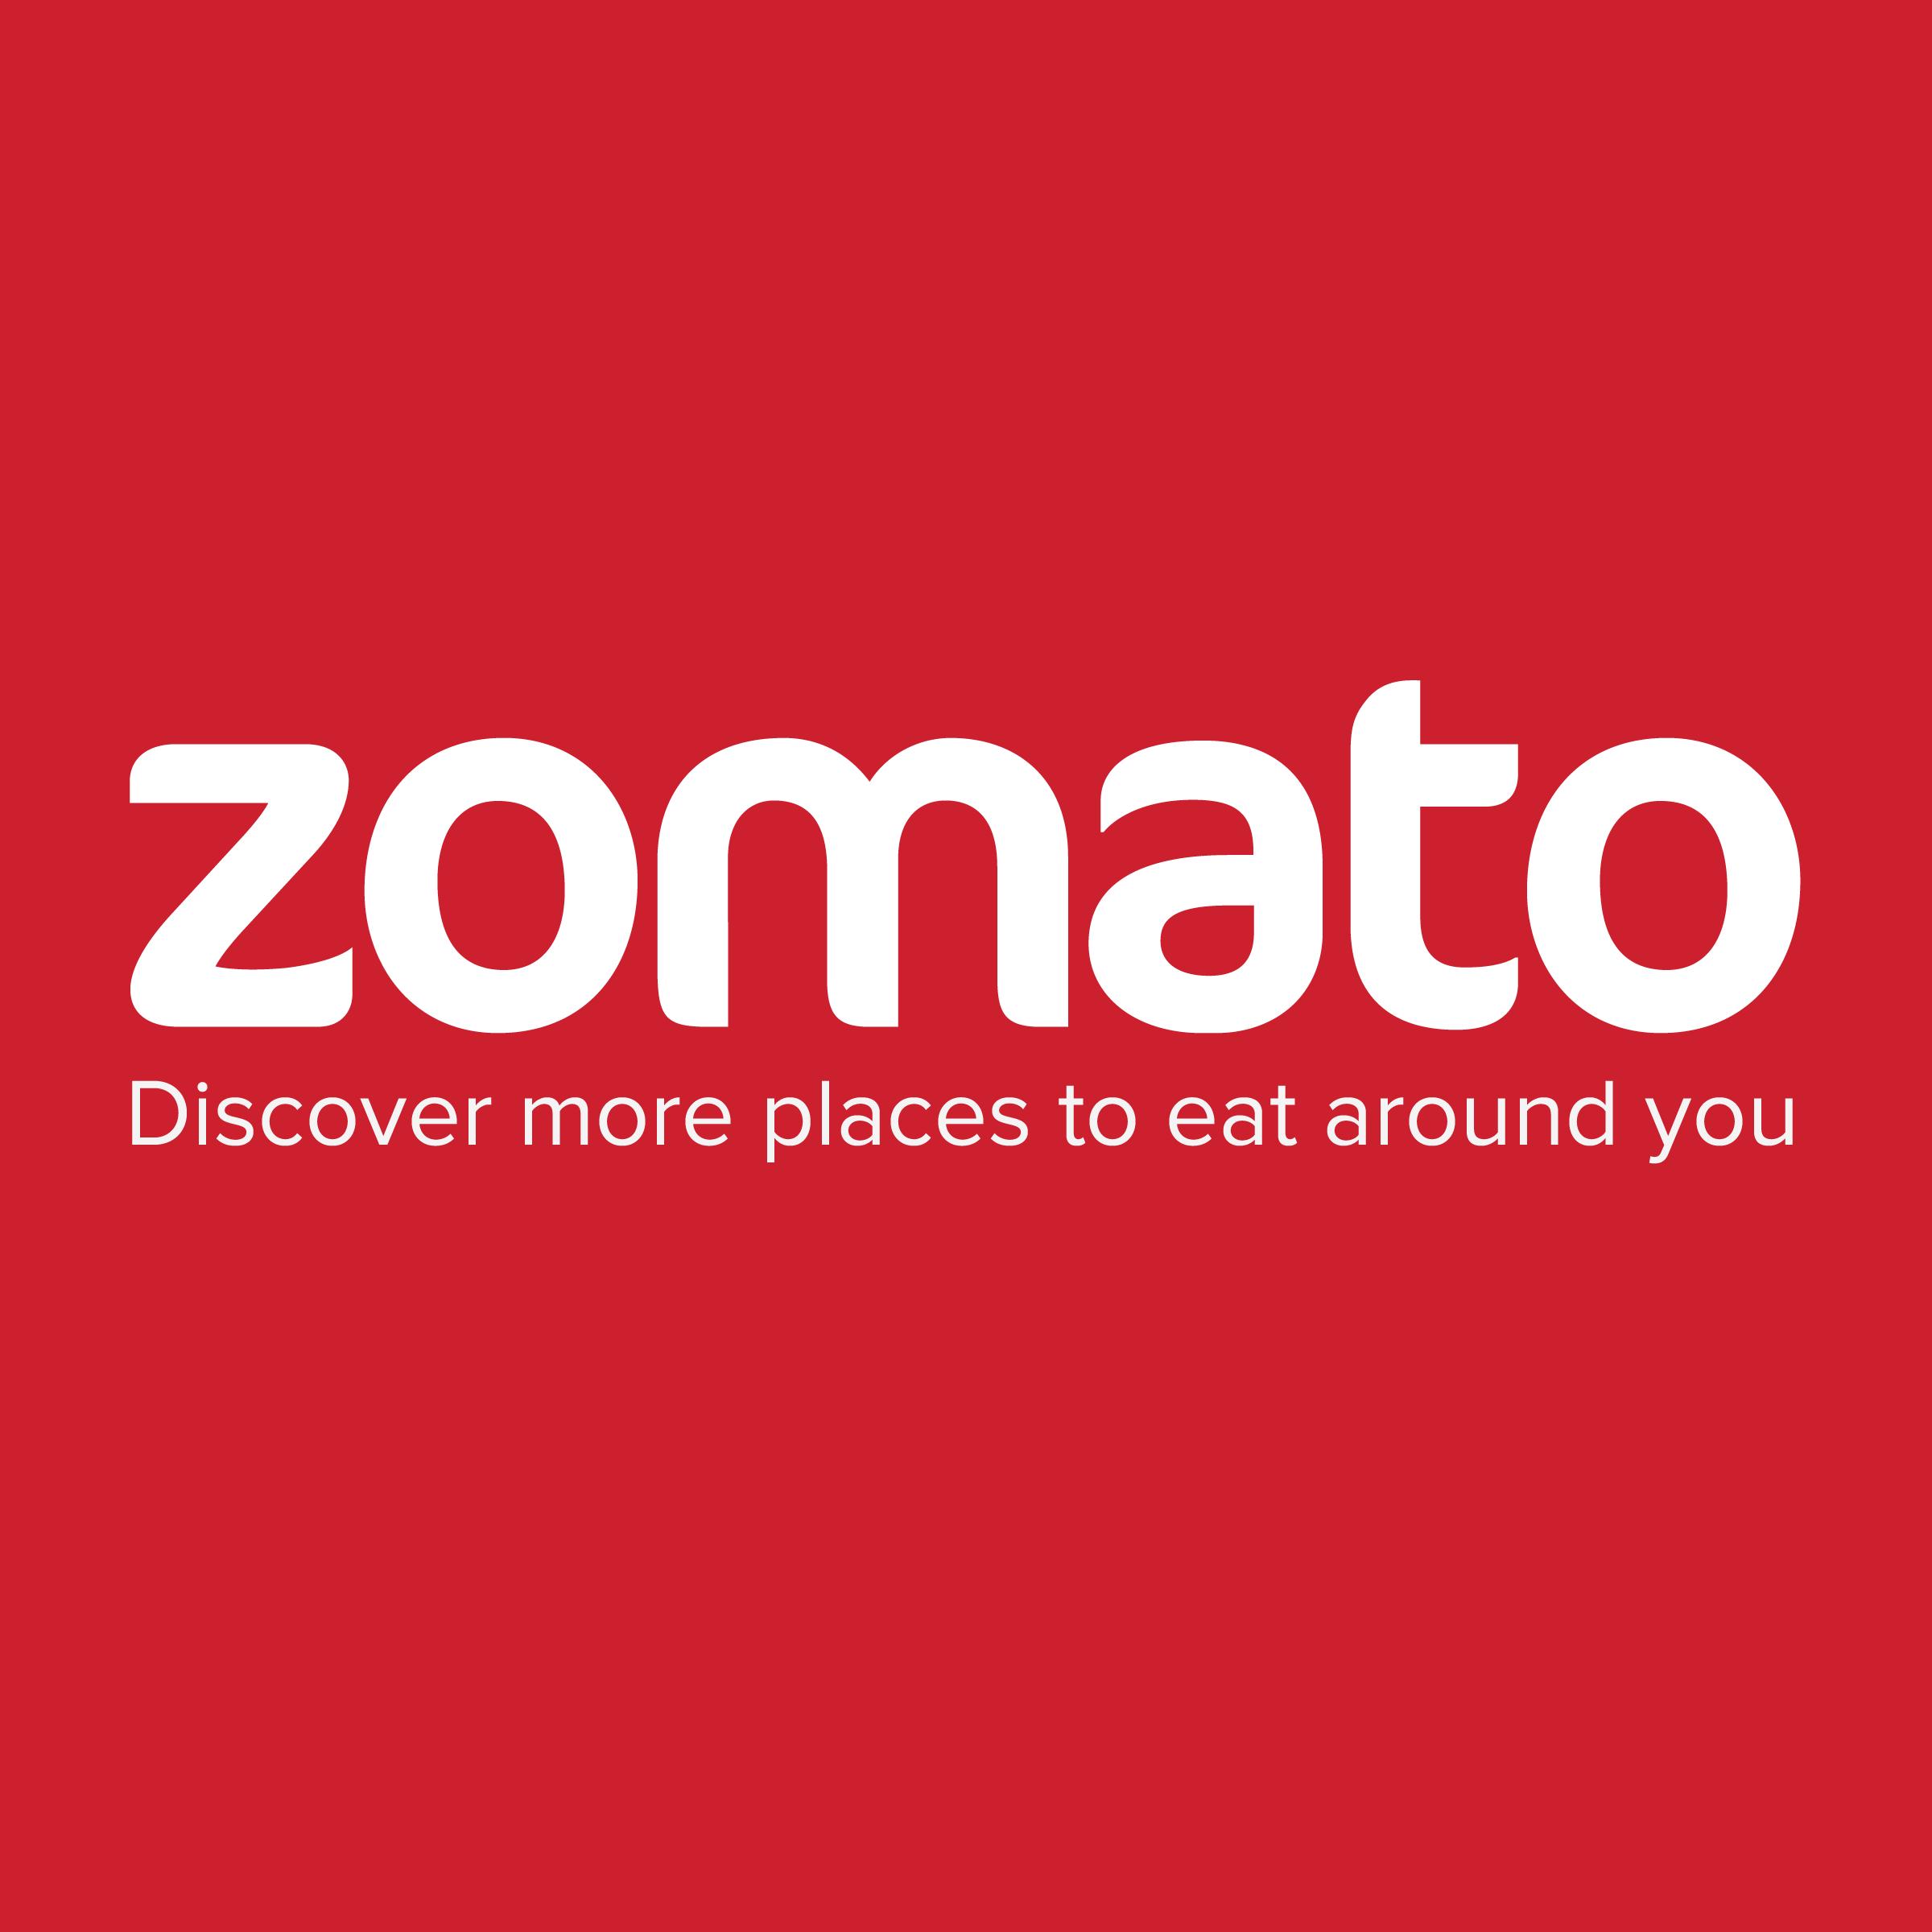 All Hail Zomato!